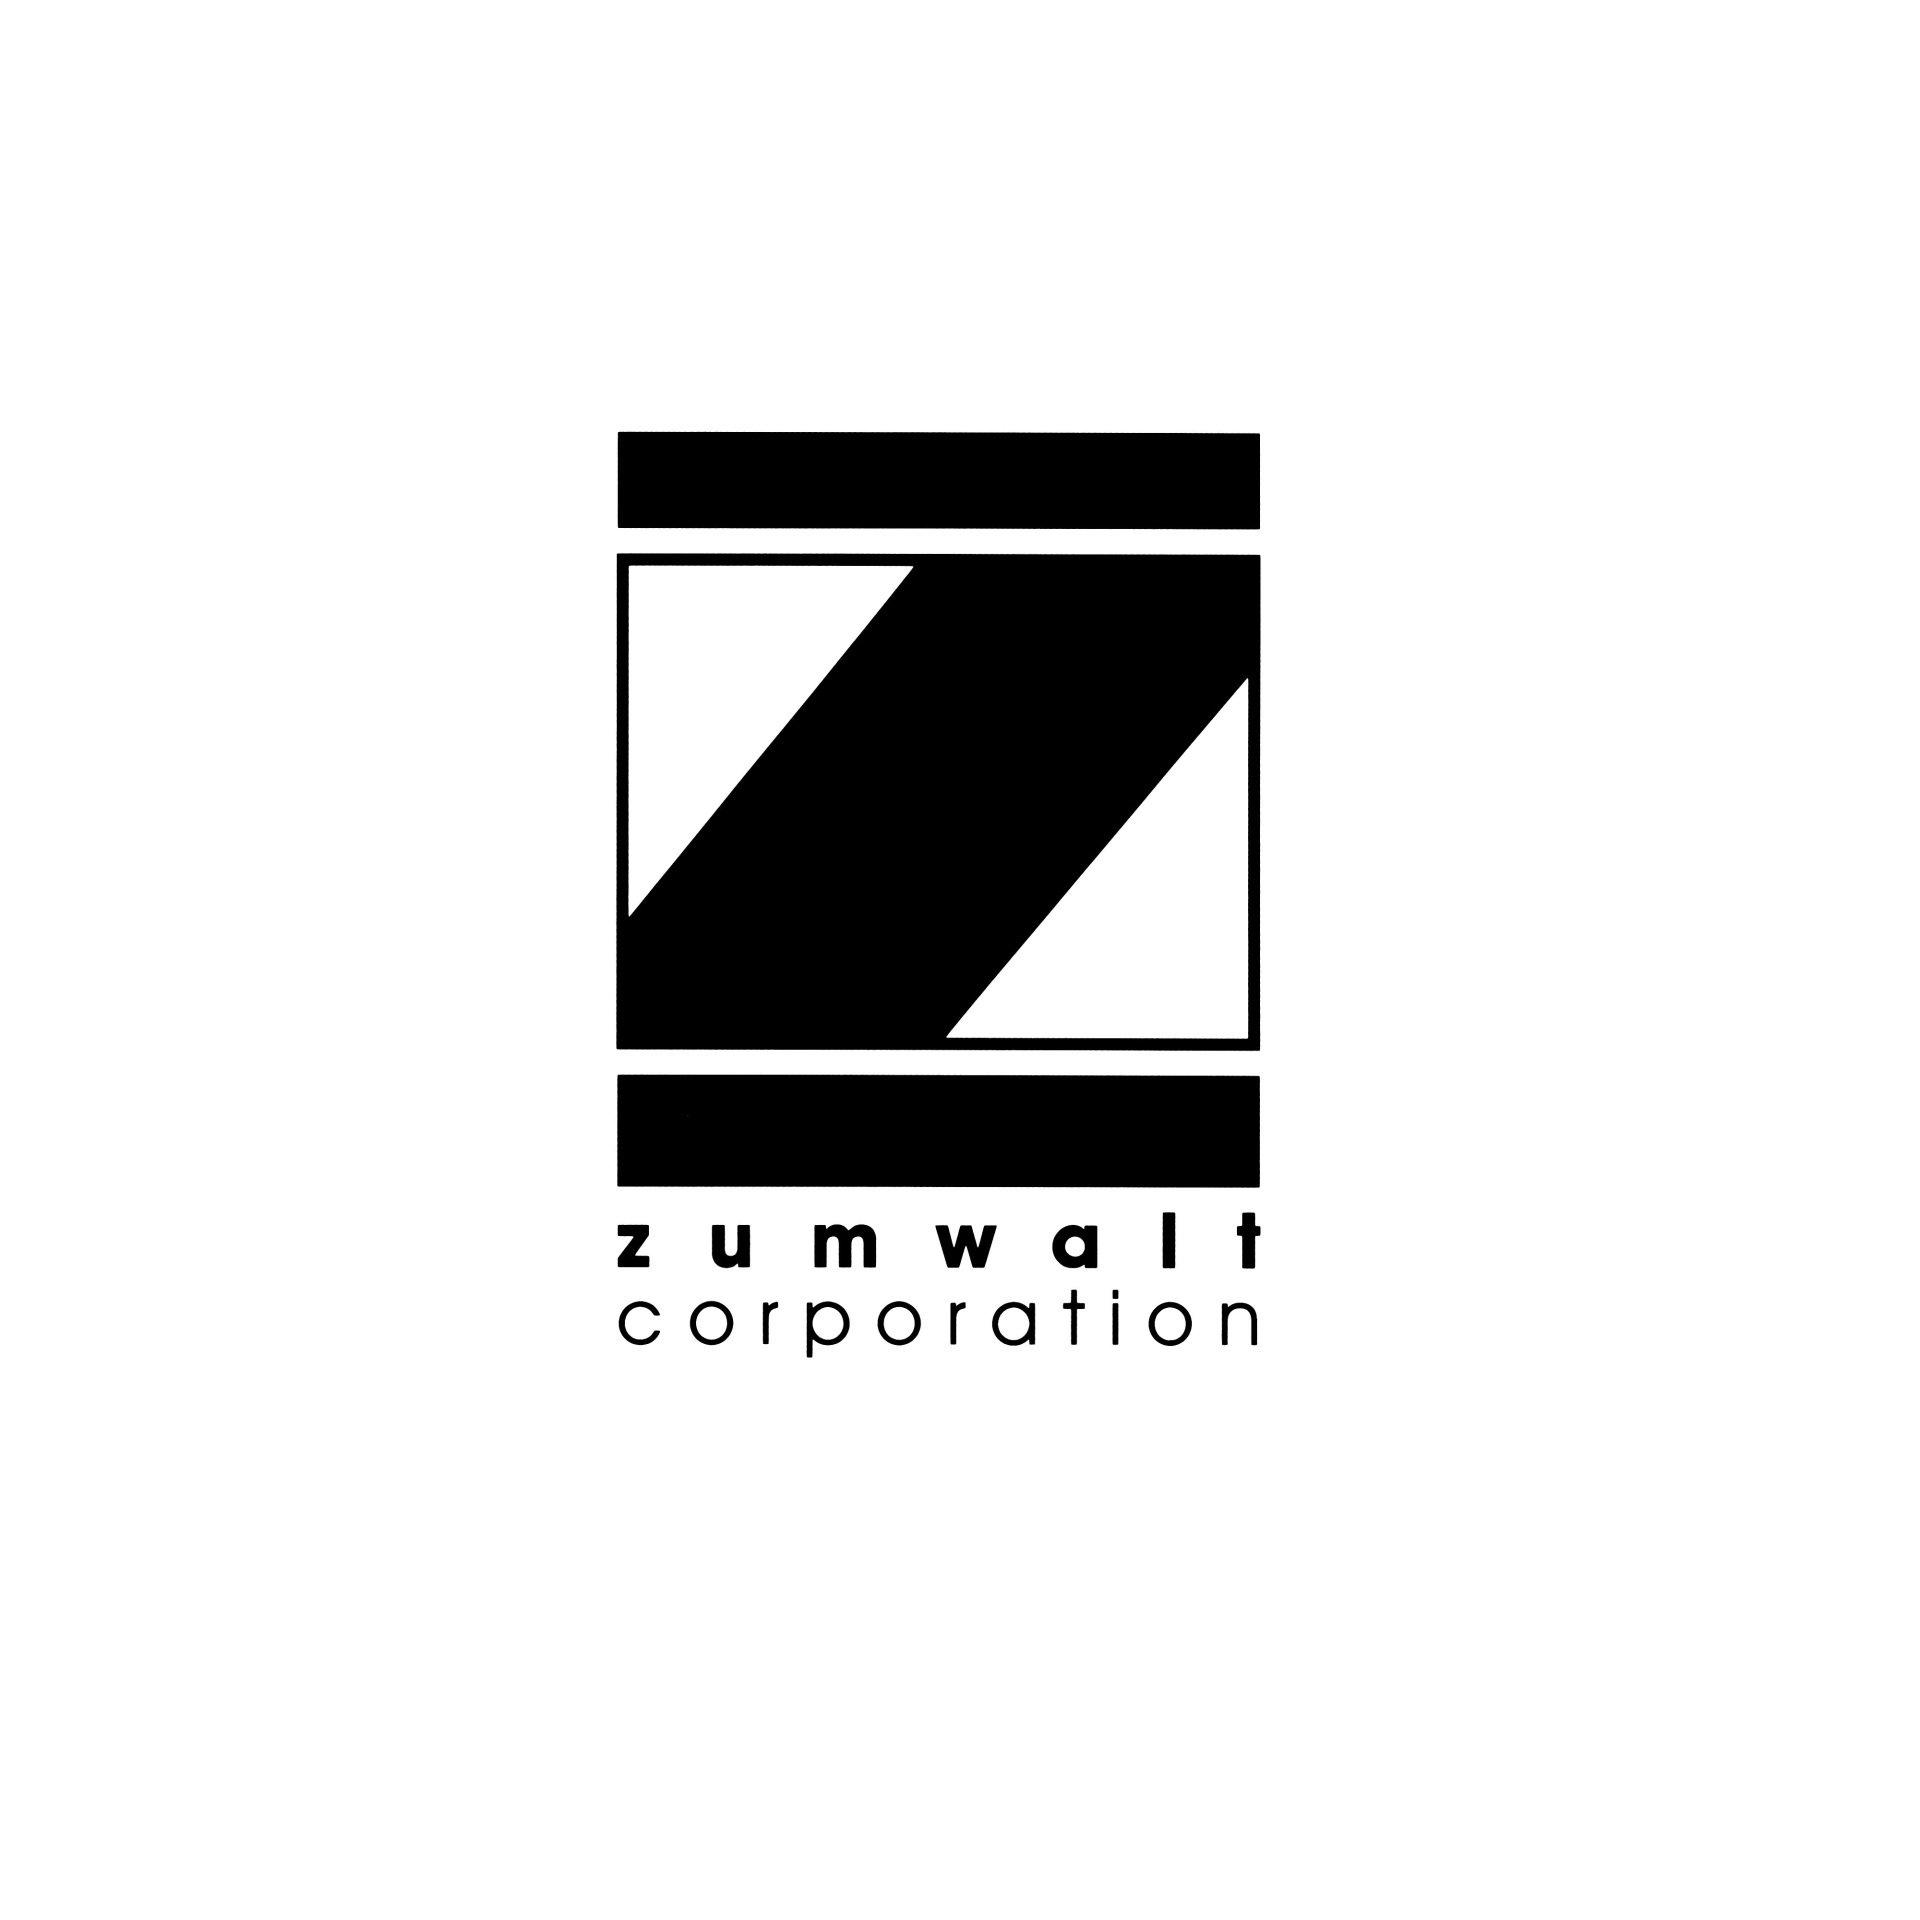 St Louis Garage Doors Zumwalt Corporation